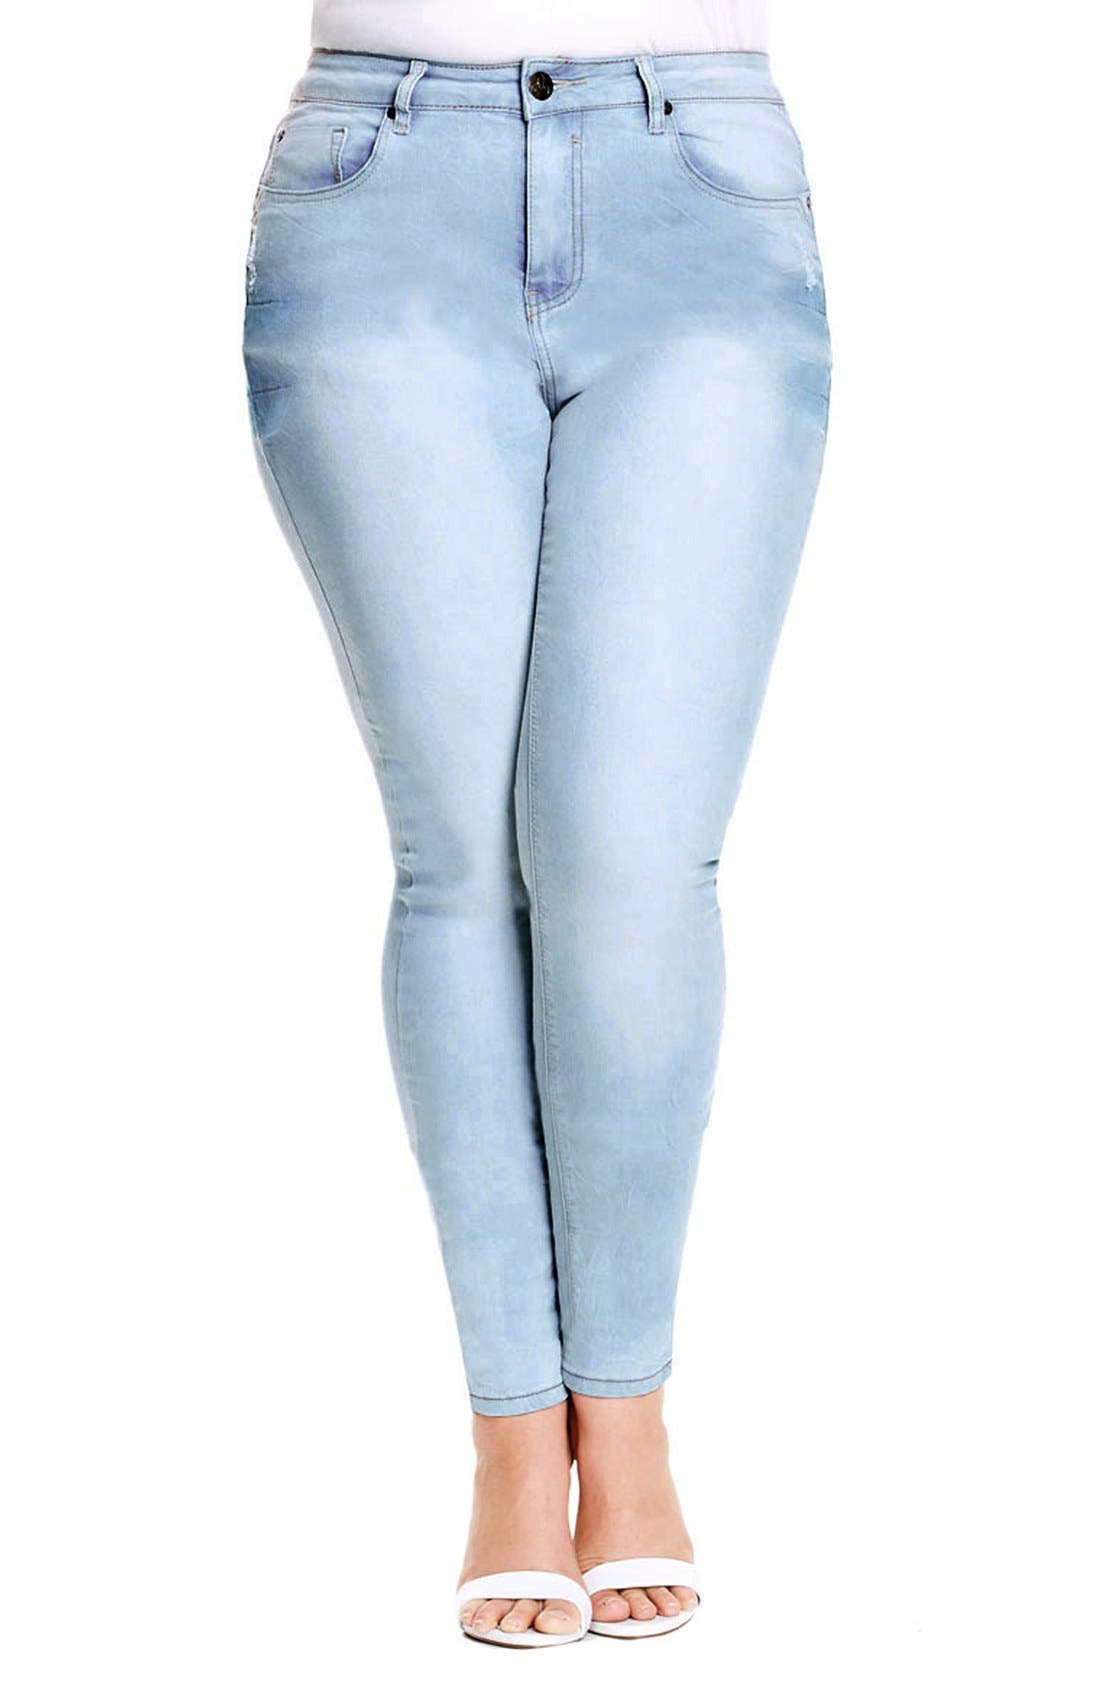 Main Image - City Chic 'Blue Baby' Stretch Skinny Jeans (Light Denim) (Plus Size)